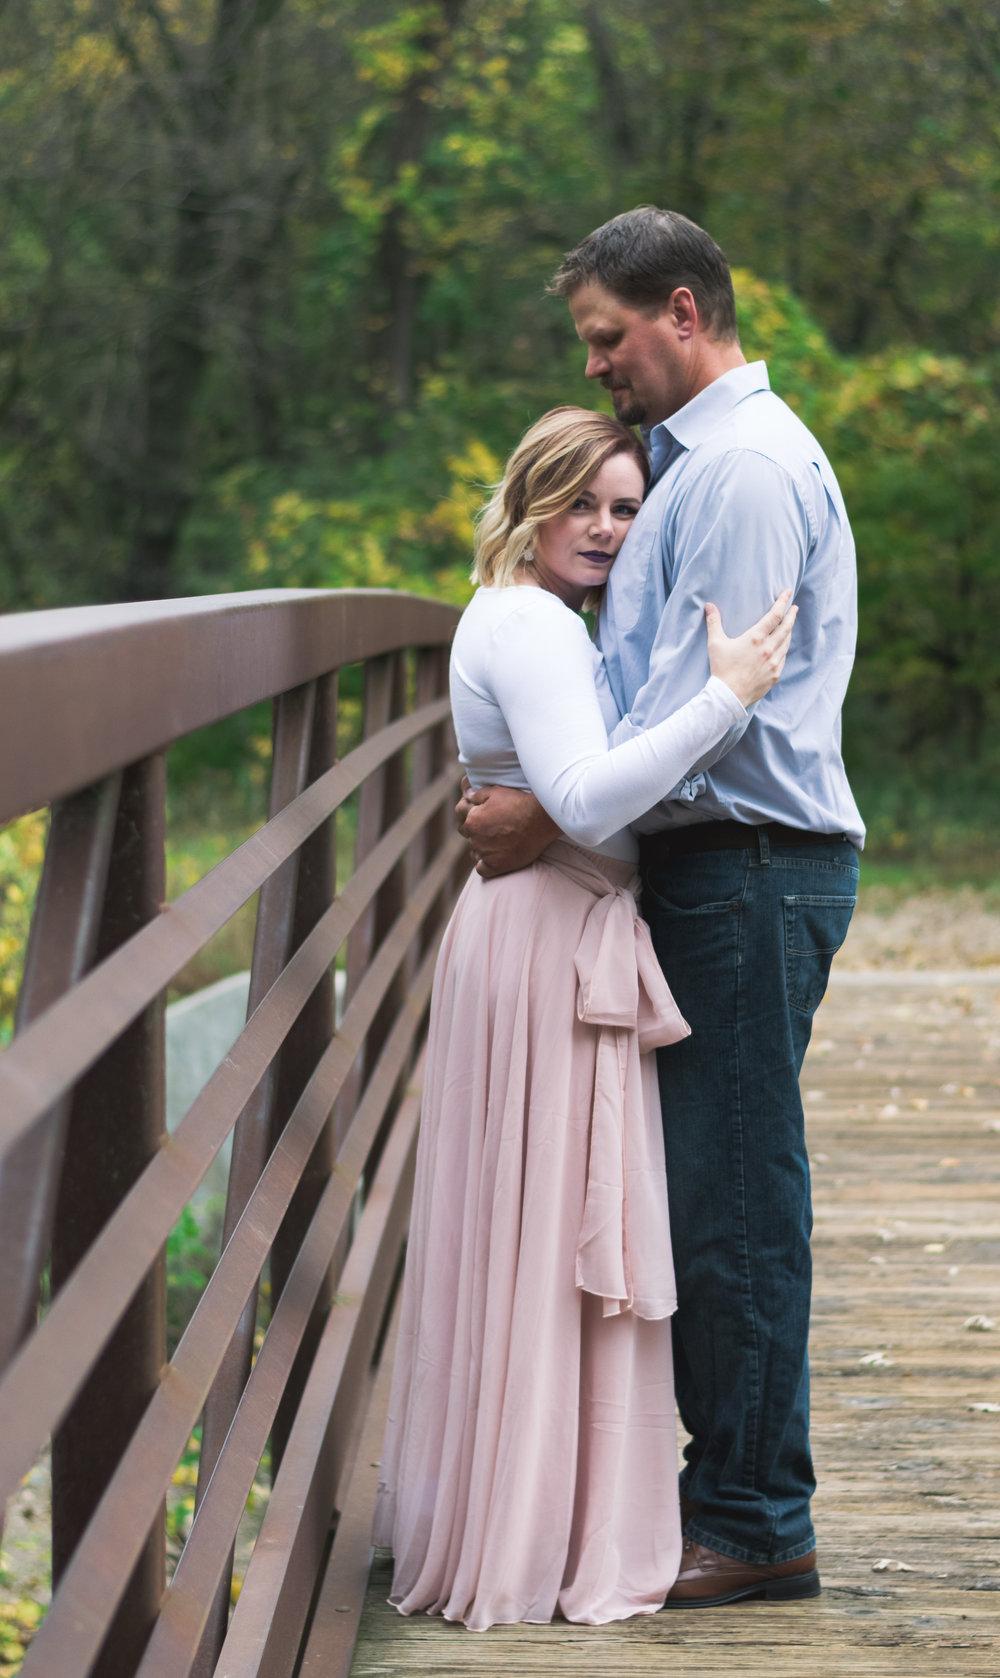 Fargo, North Dakota couples photos - Chelsea Joy Photography